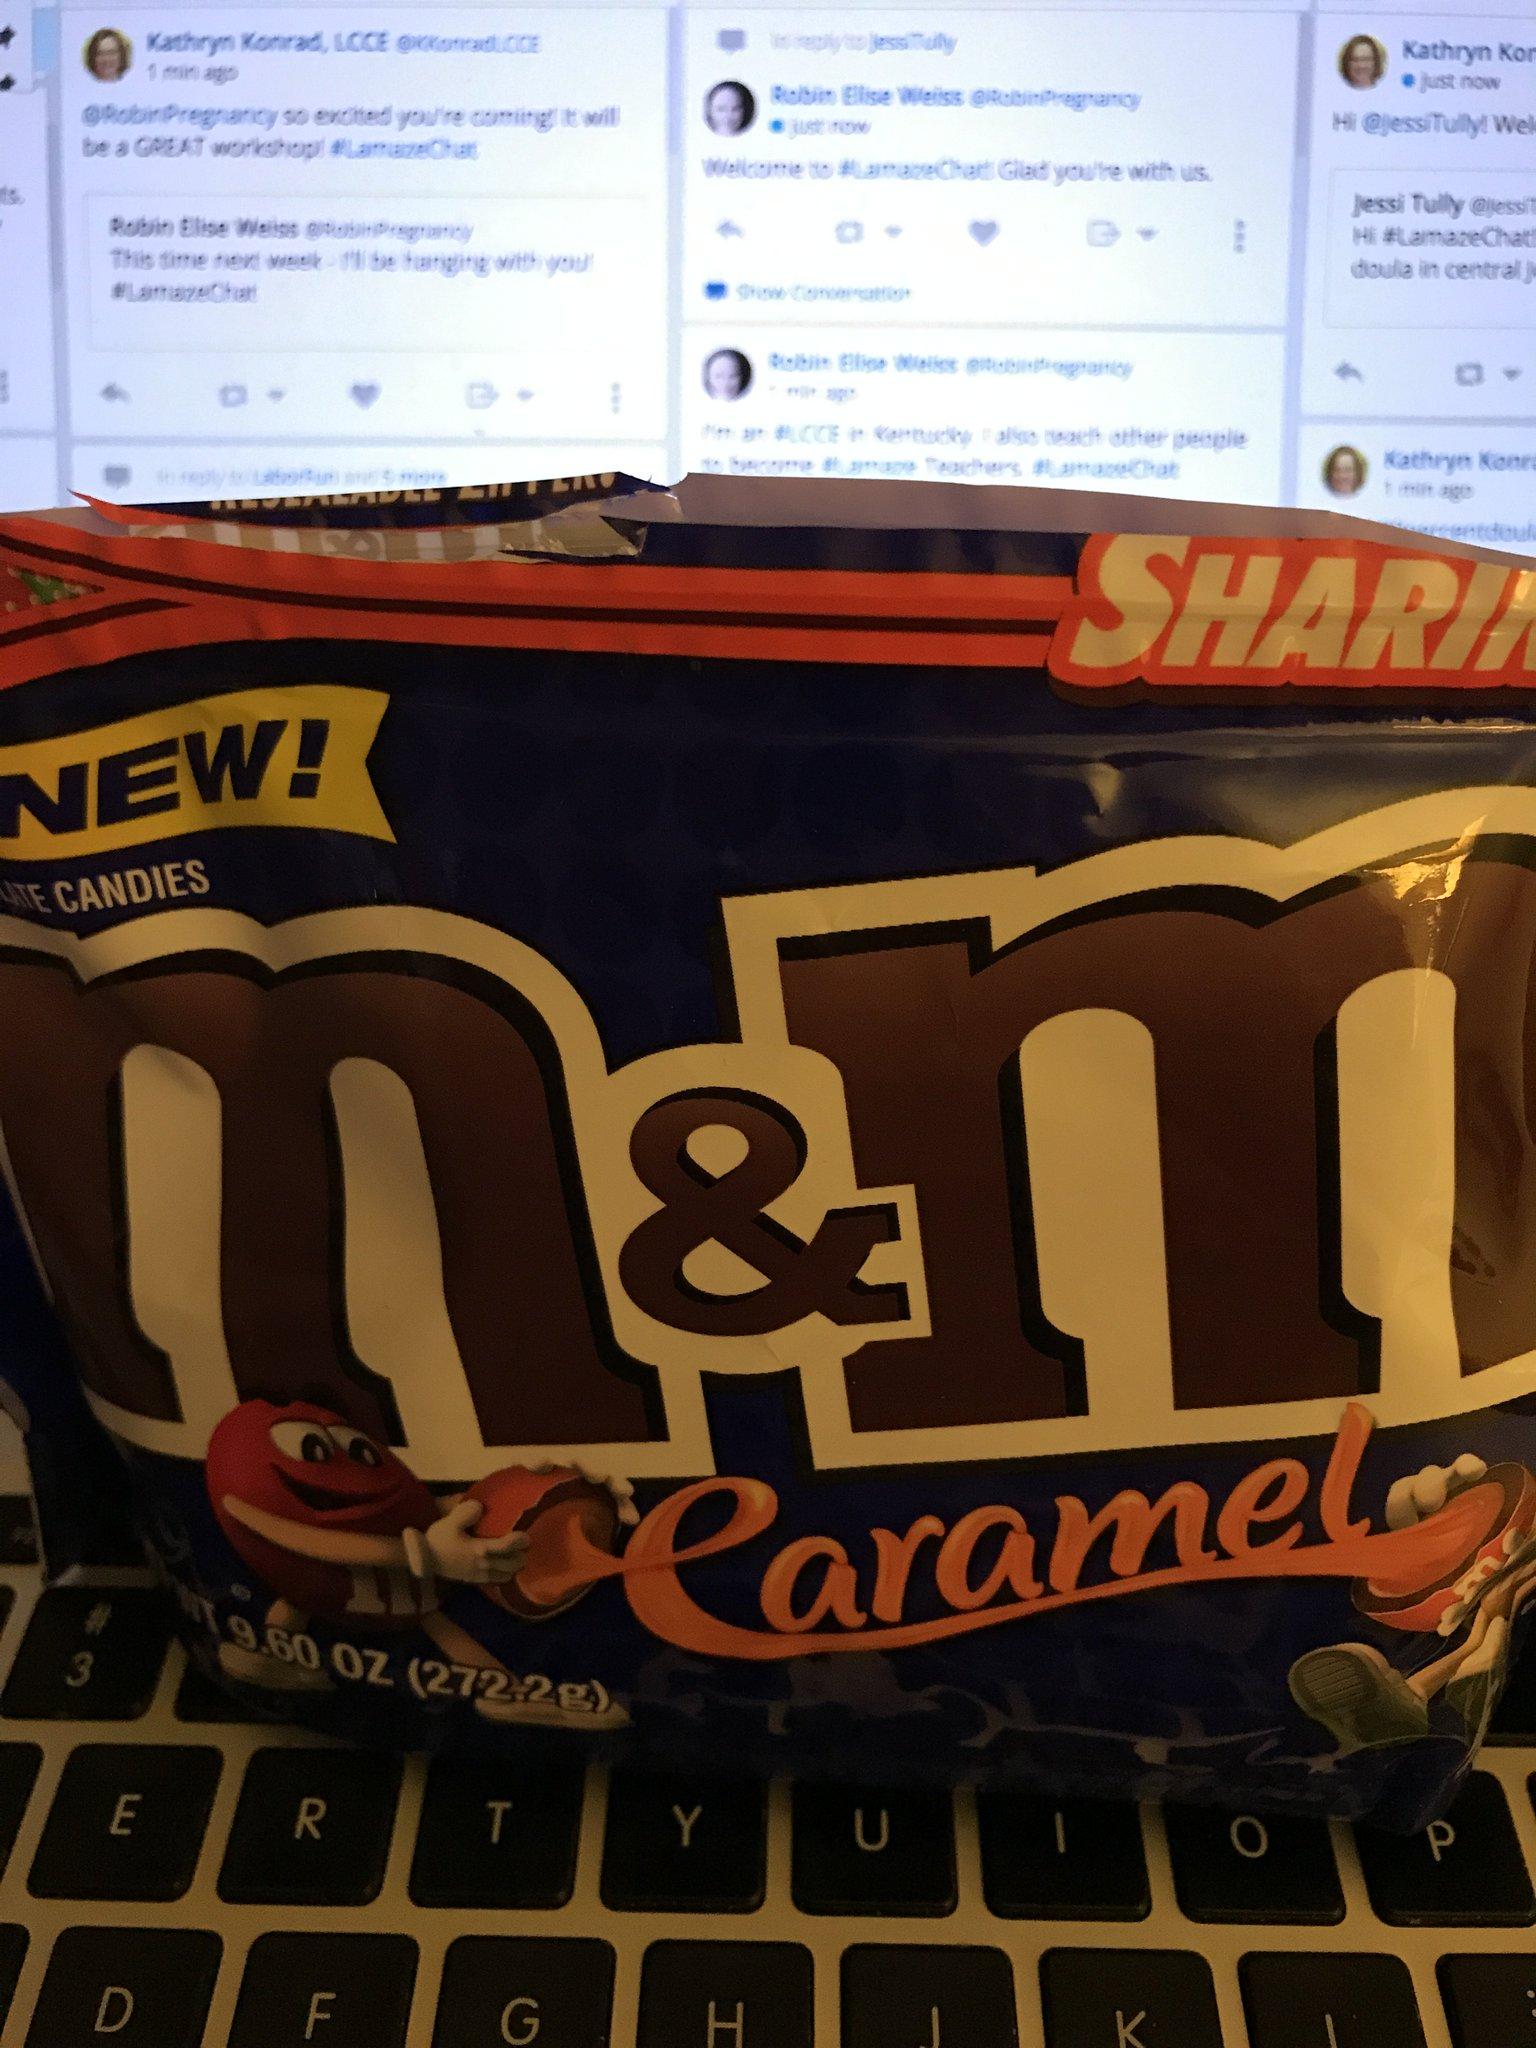 I have snacks for #LamazeChat https://t.co/LDrjnW6ei5